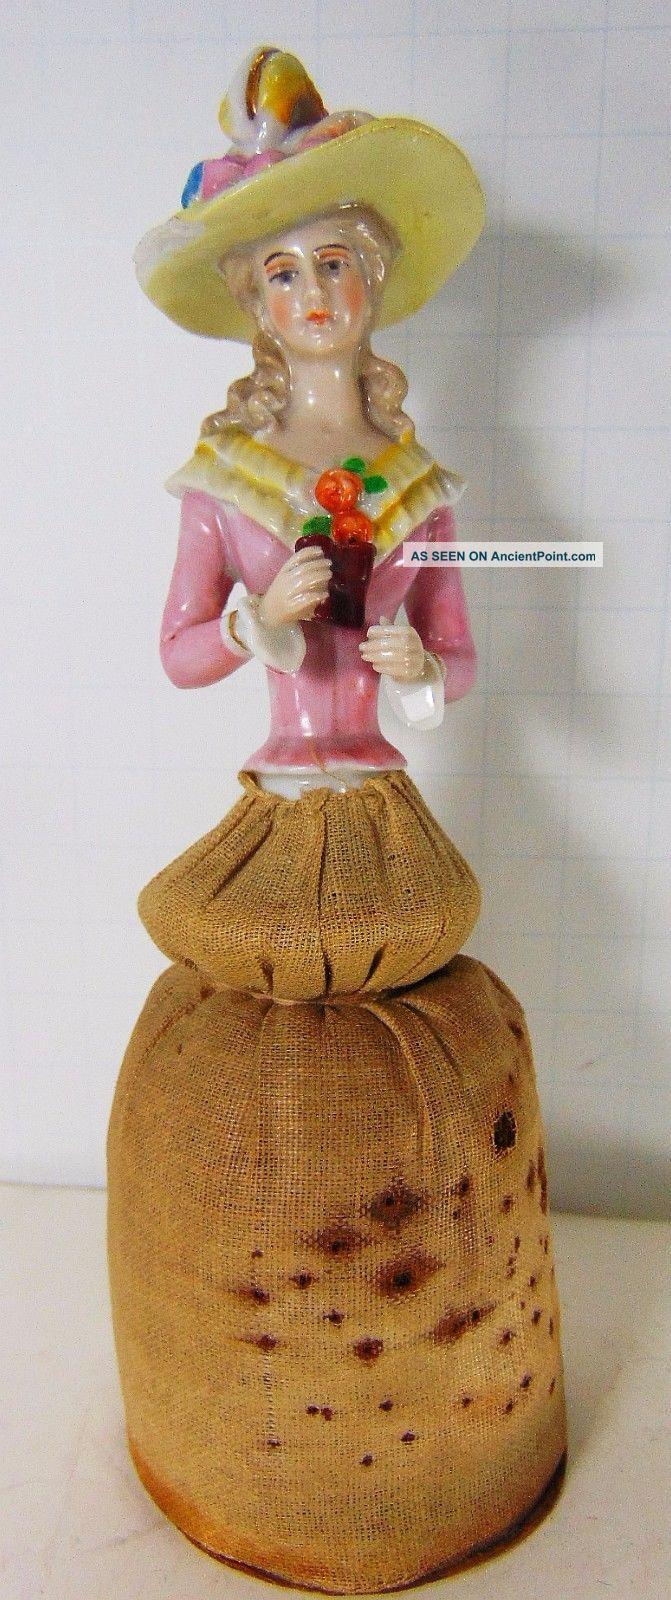 Antique Vtg Porcelain Half Doll Pincushion Bonnet Flower Binocular Ernst Horse R Pin Cushions photo